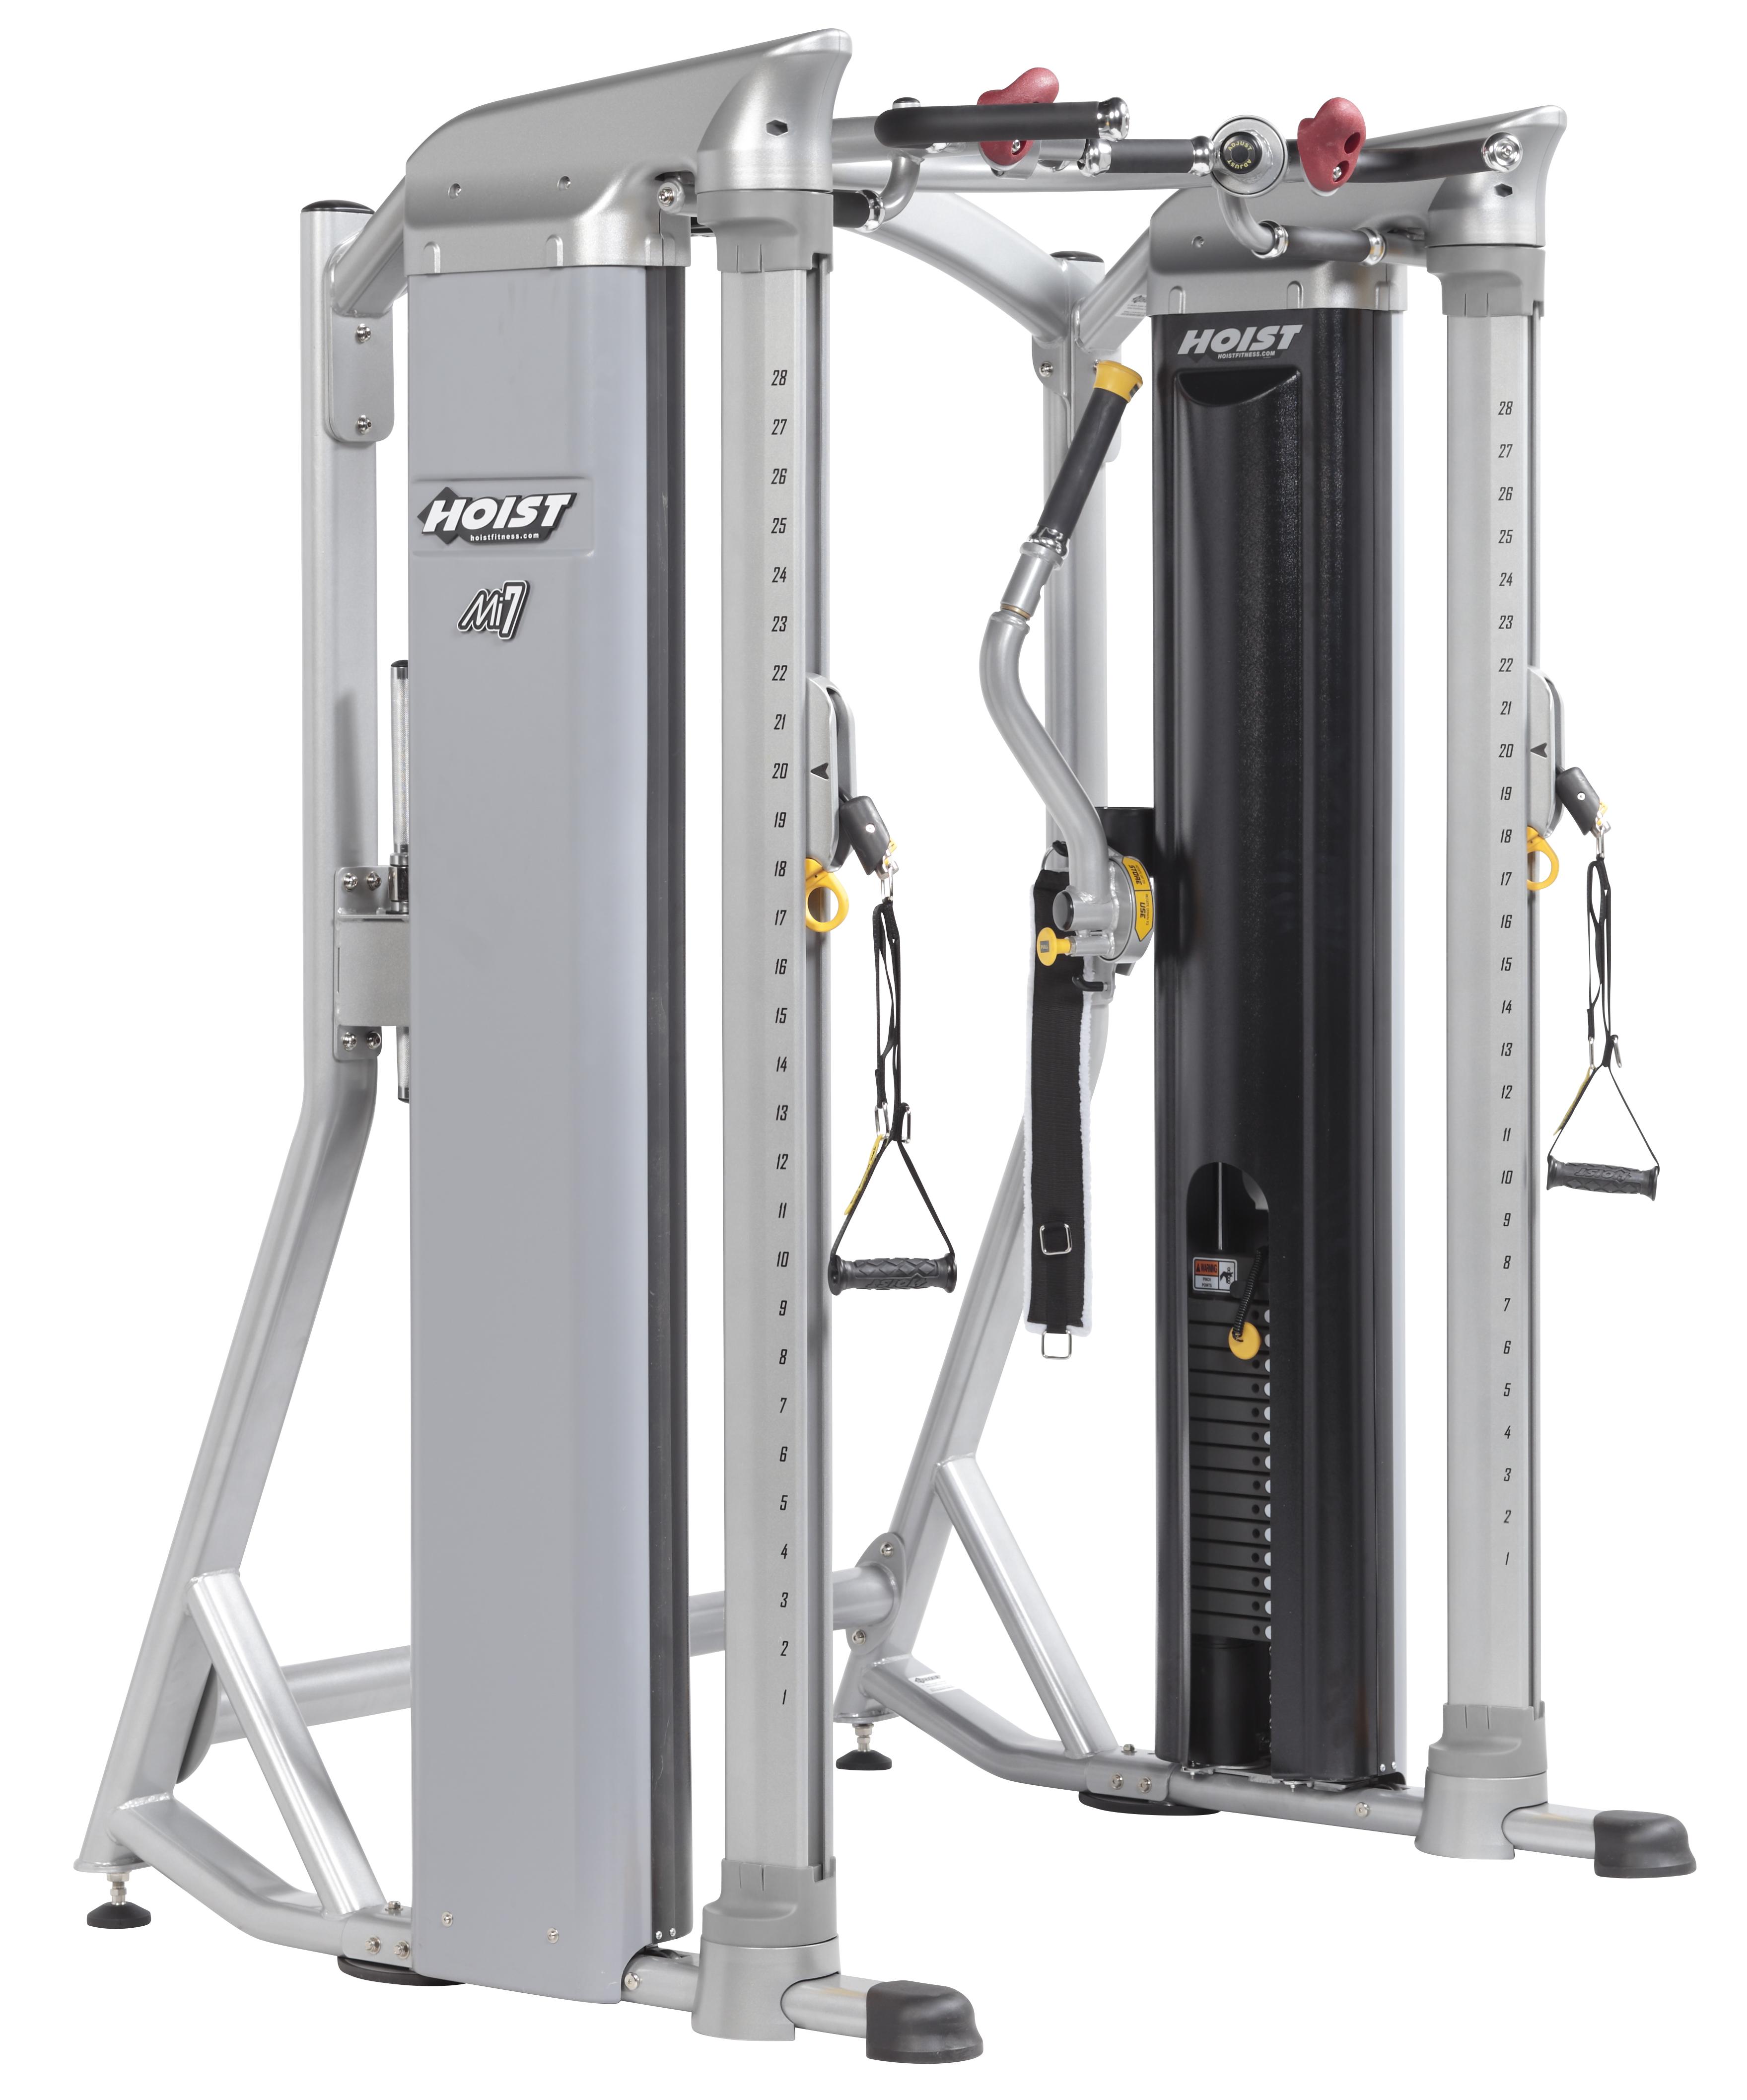 Hoist MI7 Multi-Functional Training System